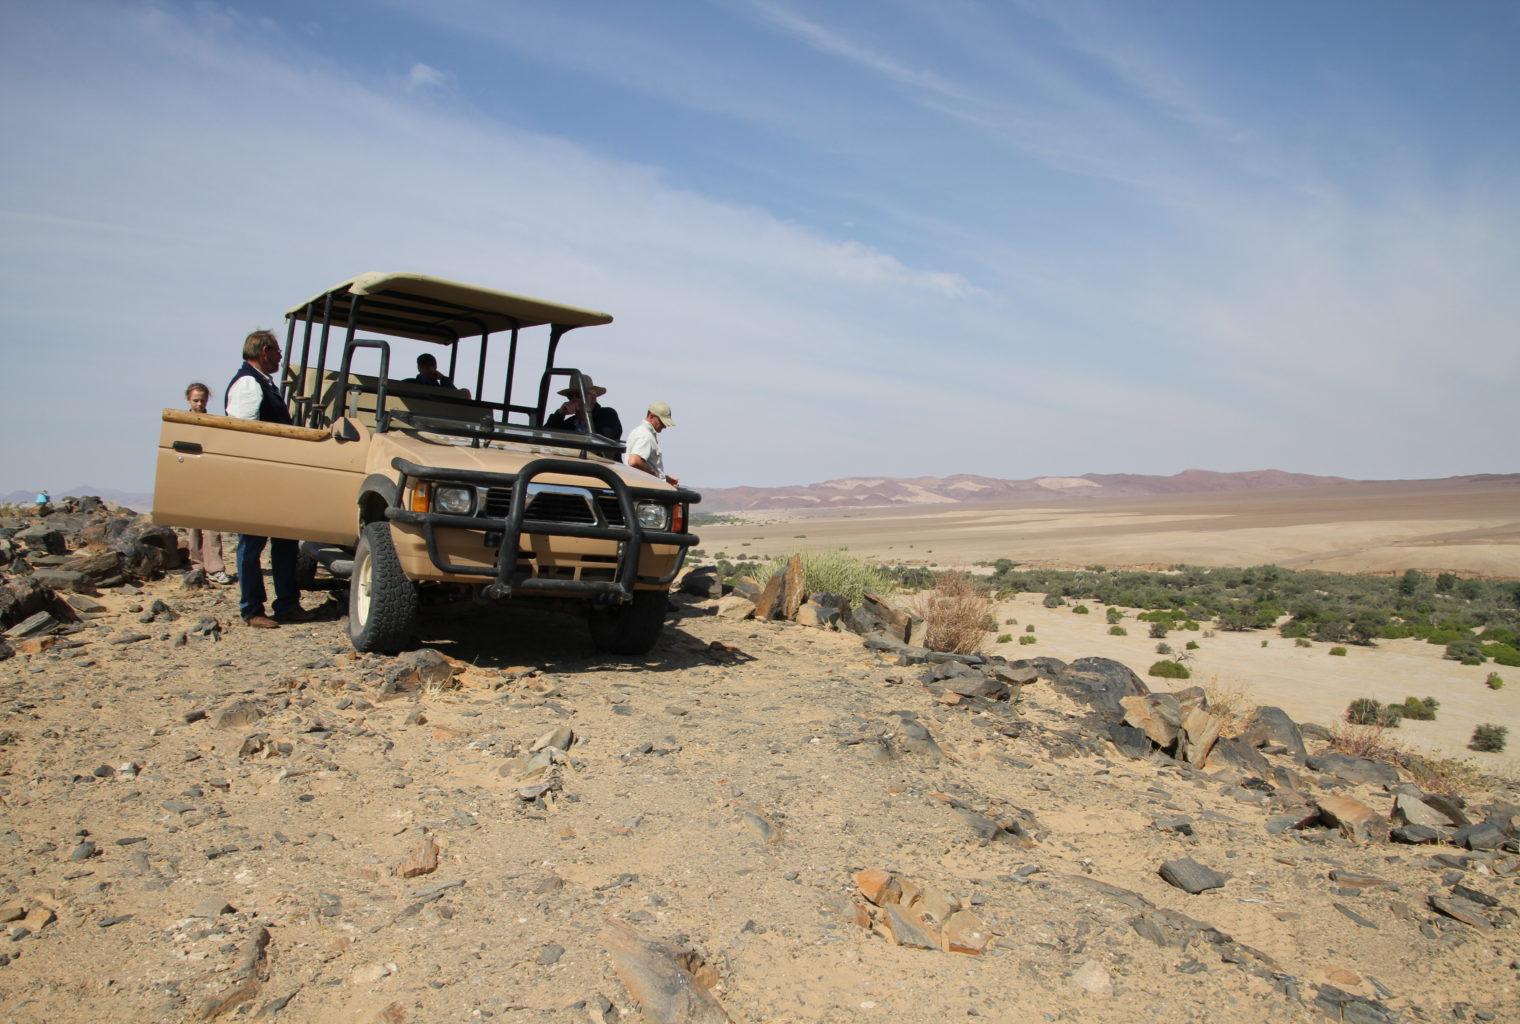 Leylandsdrift Camp Namibia Drive